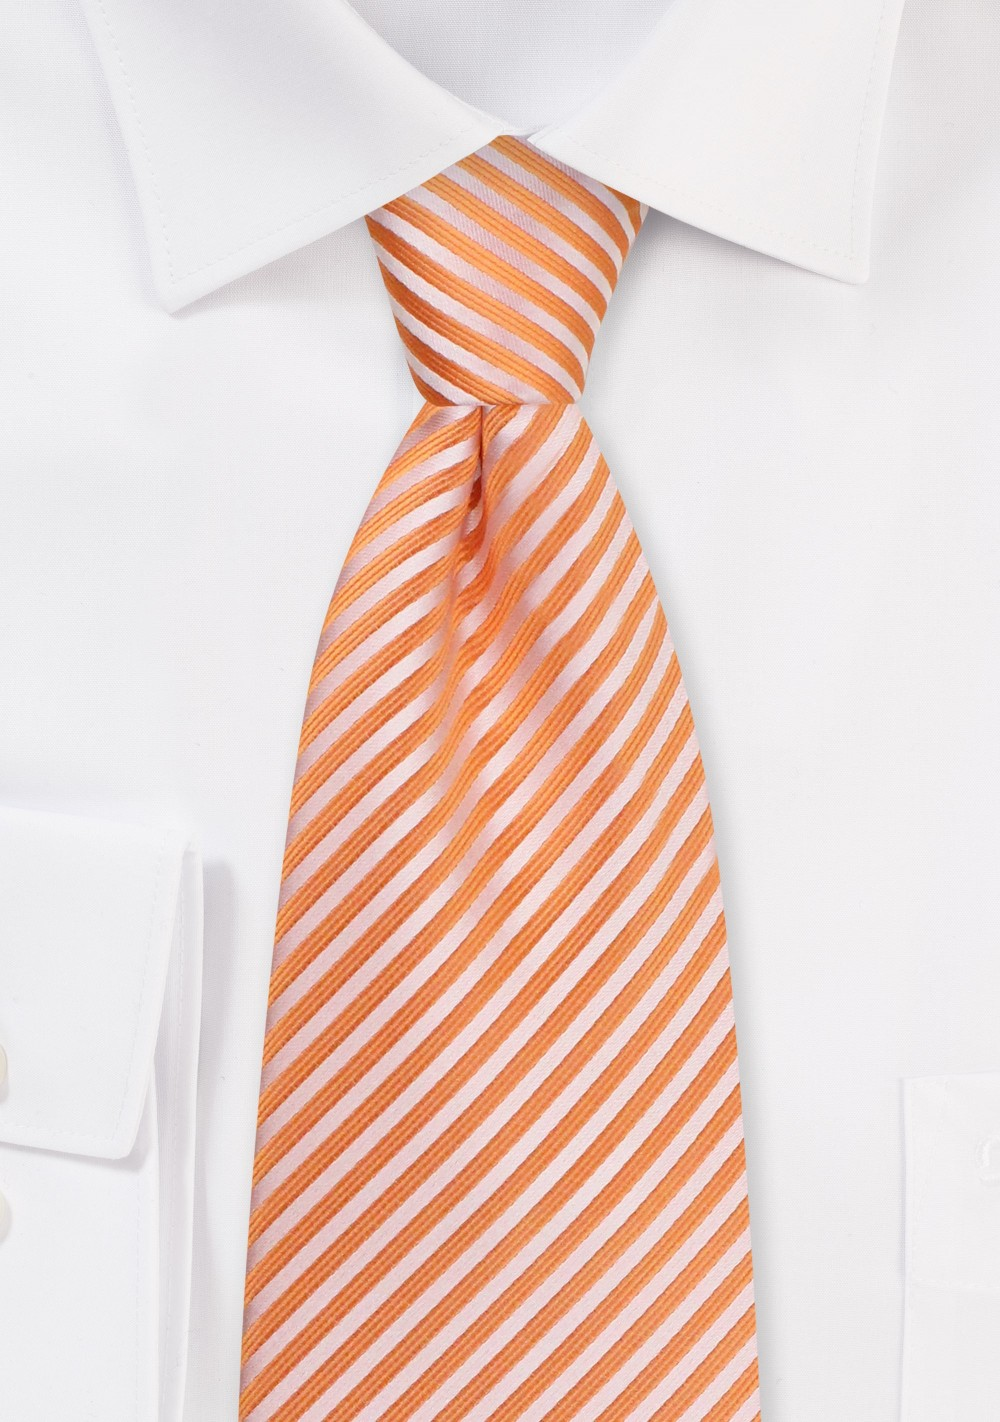 Tangerine Necktie - Tangerine Tie with Narrow Stripes